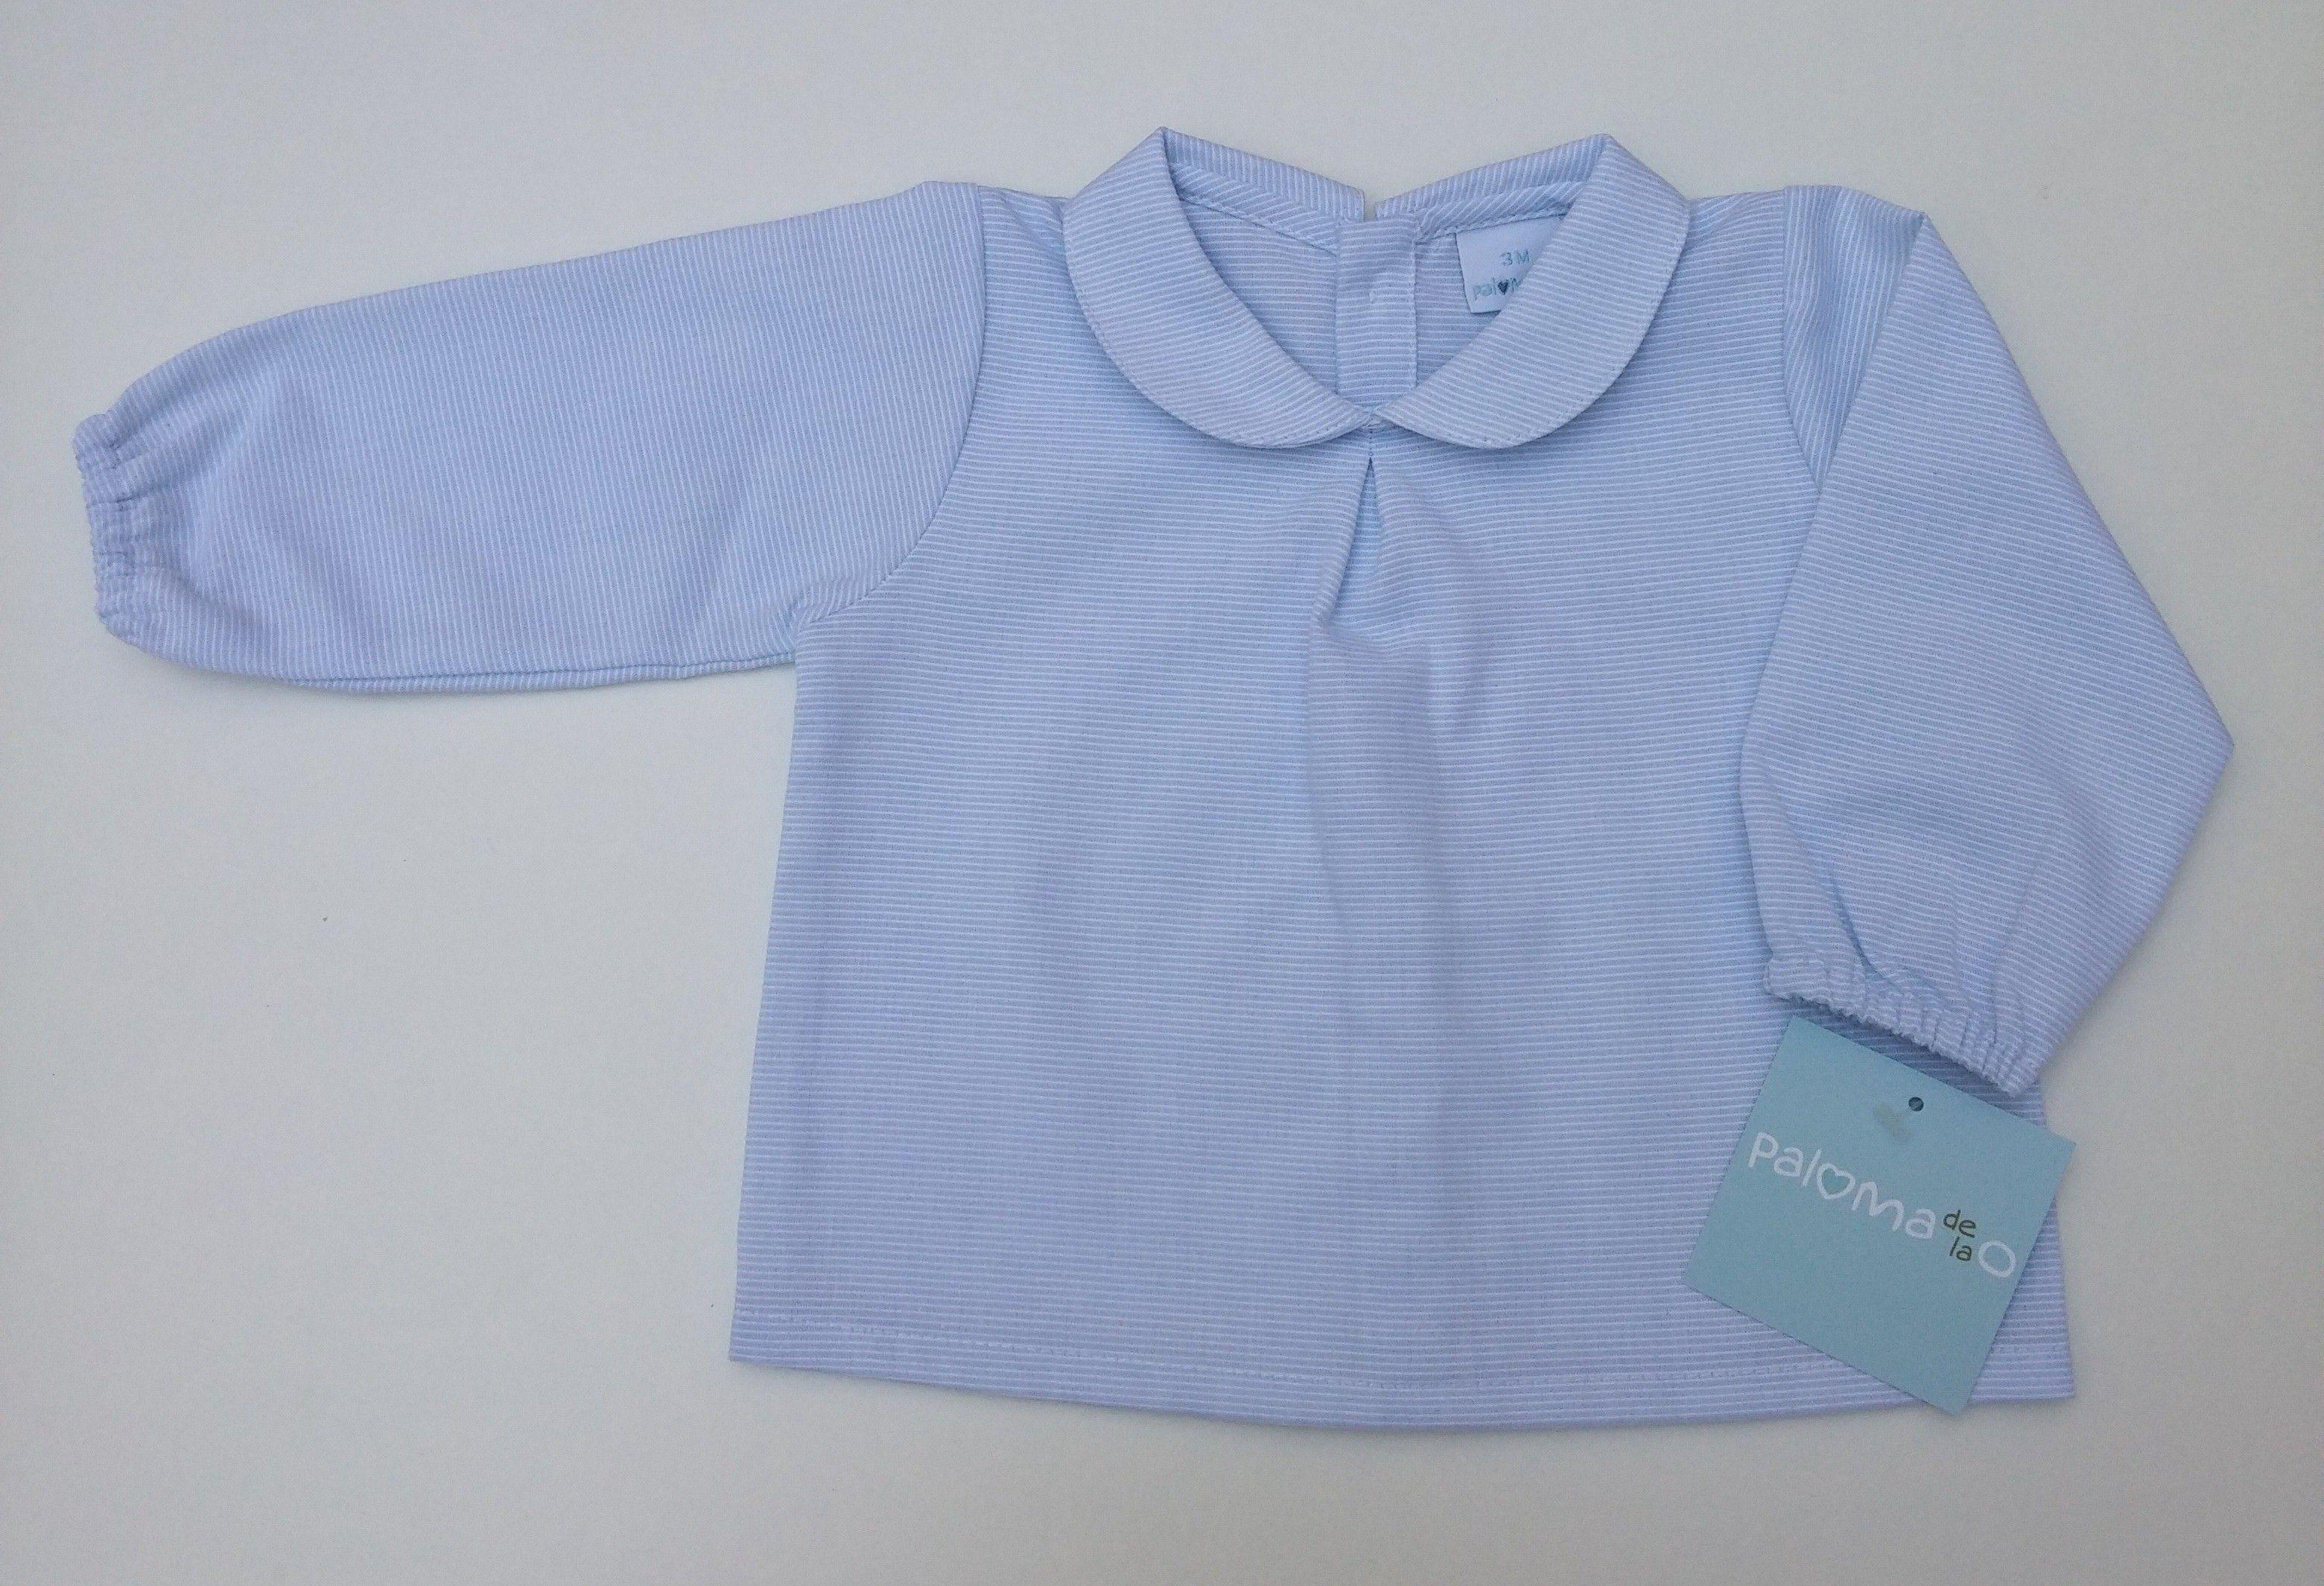 38904d6d0 Camisa azul celeste con cuello bebé.